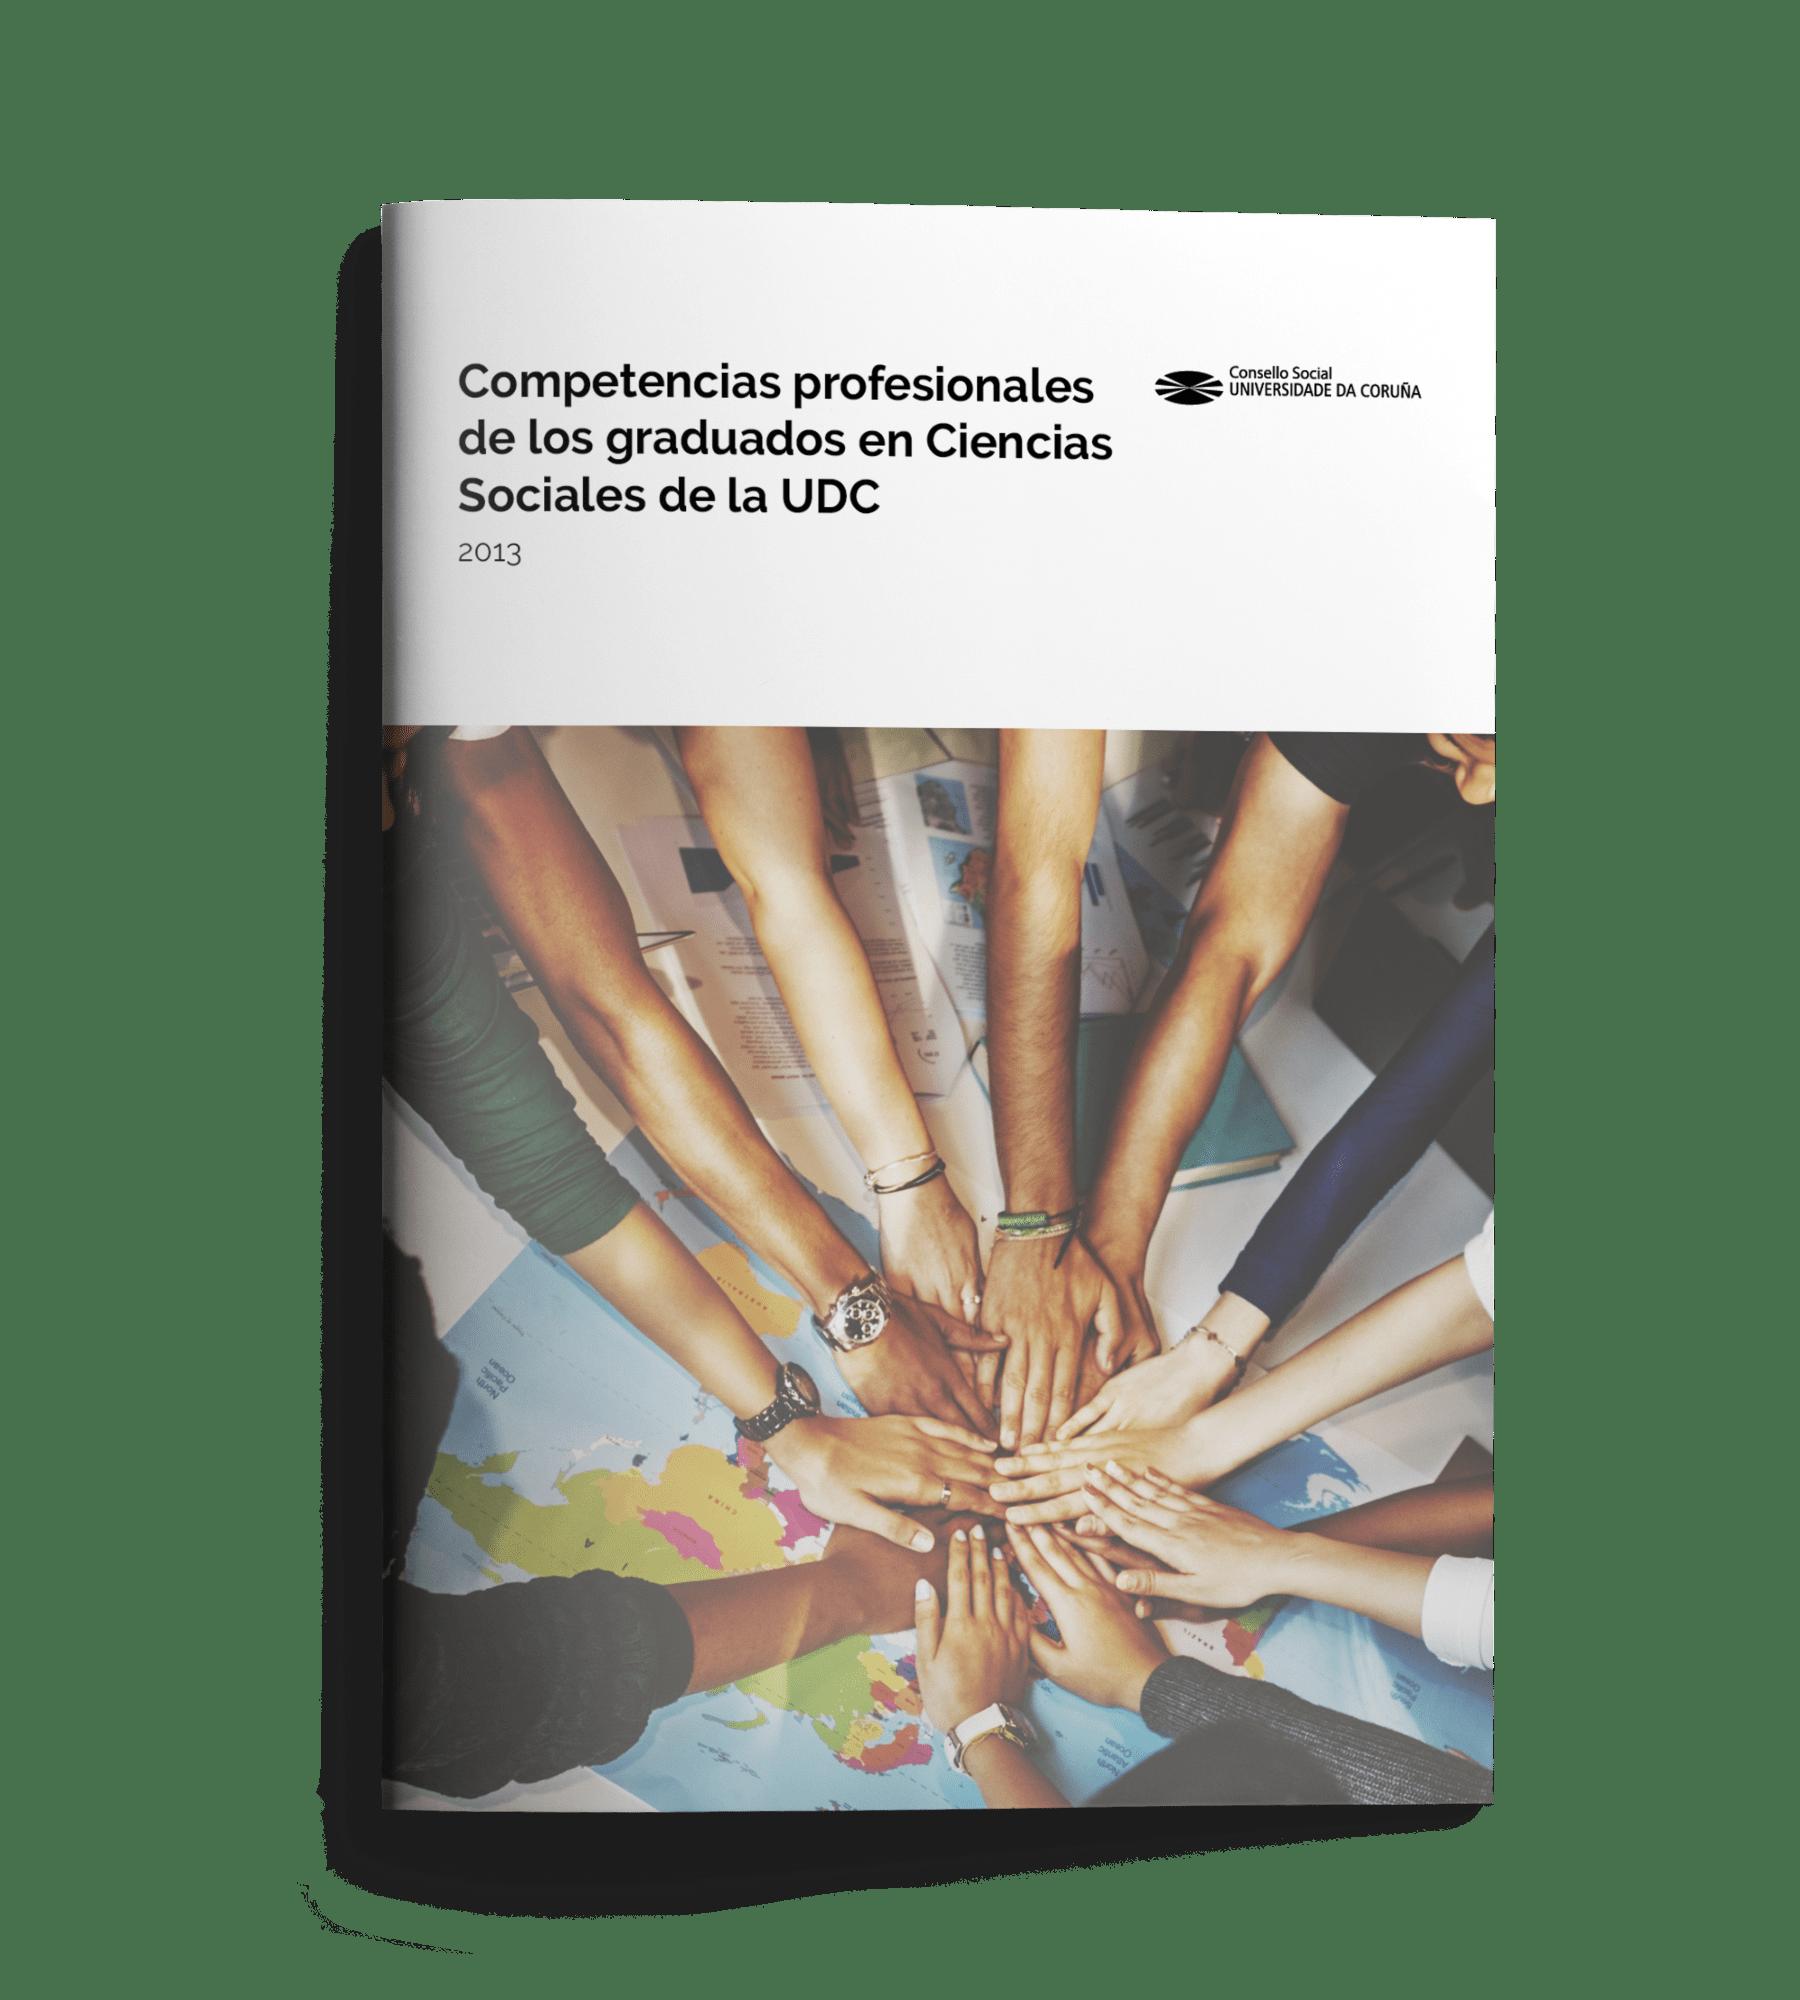 https://consellosocial.udc.es/wp-content/uploads/2019/07/competencias-profesionales-titulados-sociales.png